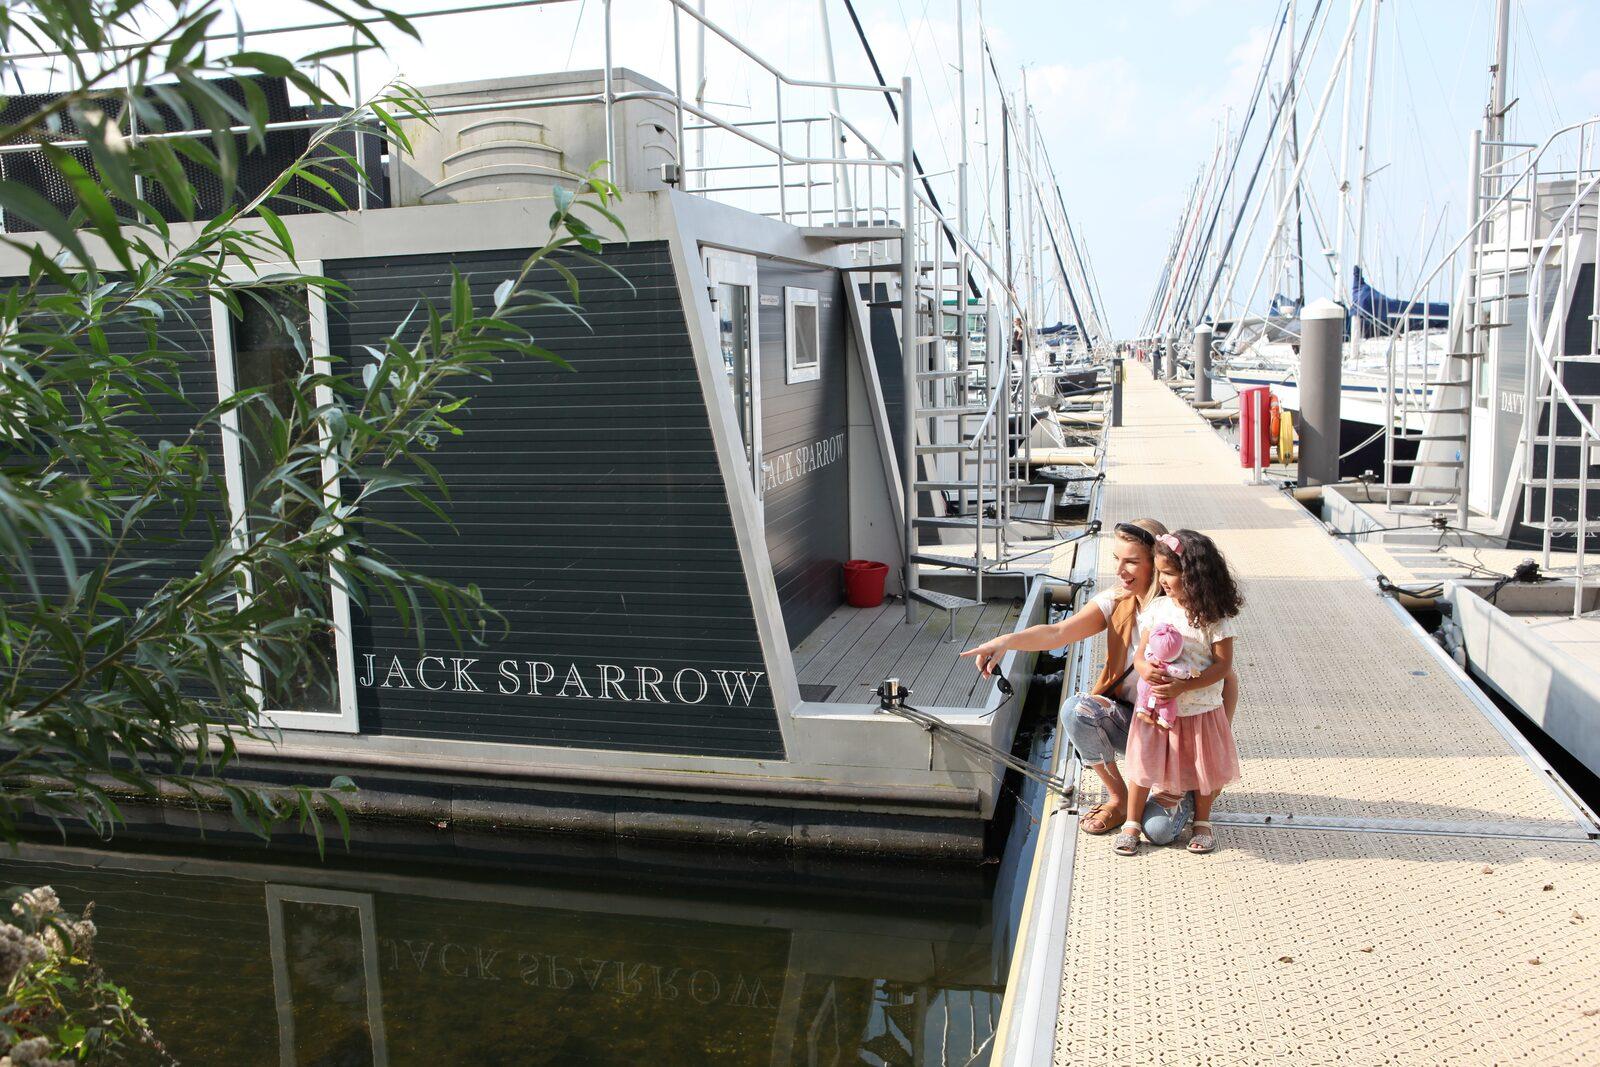 Jachthafen Muiderzand